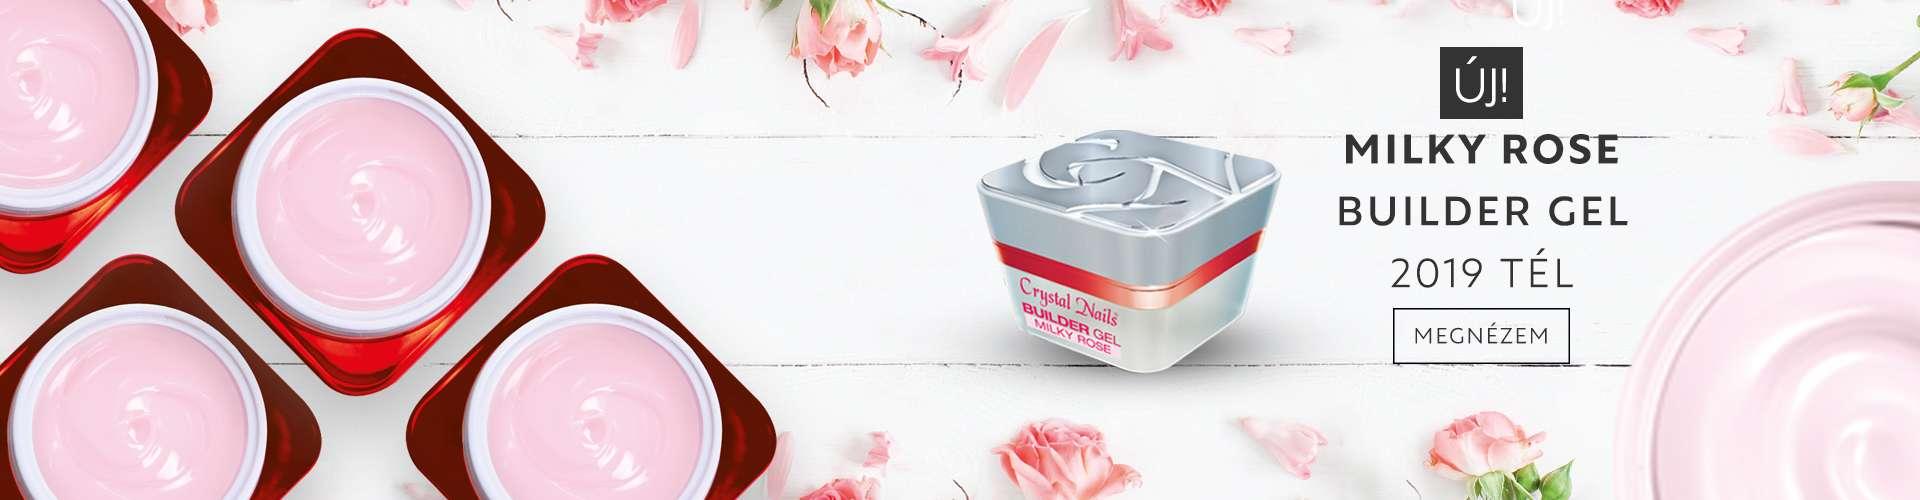 170_milky_rose